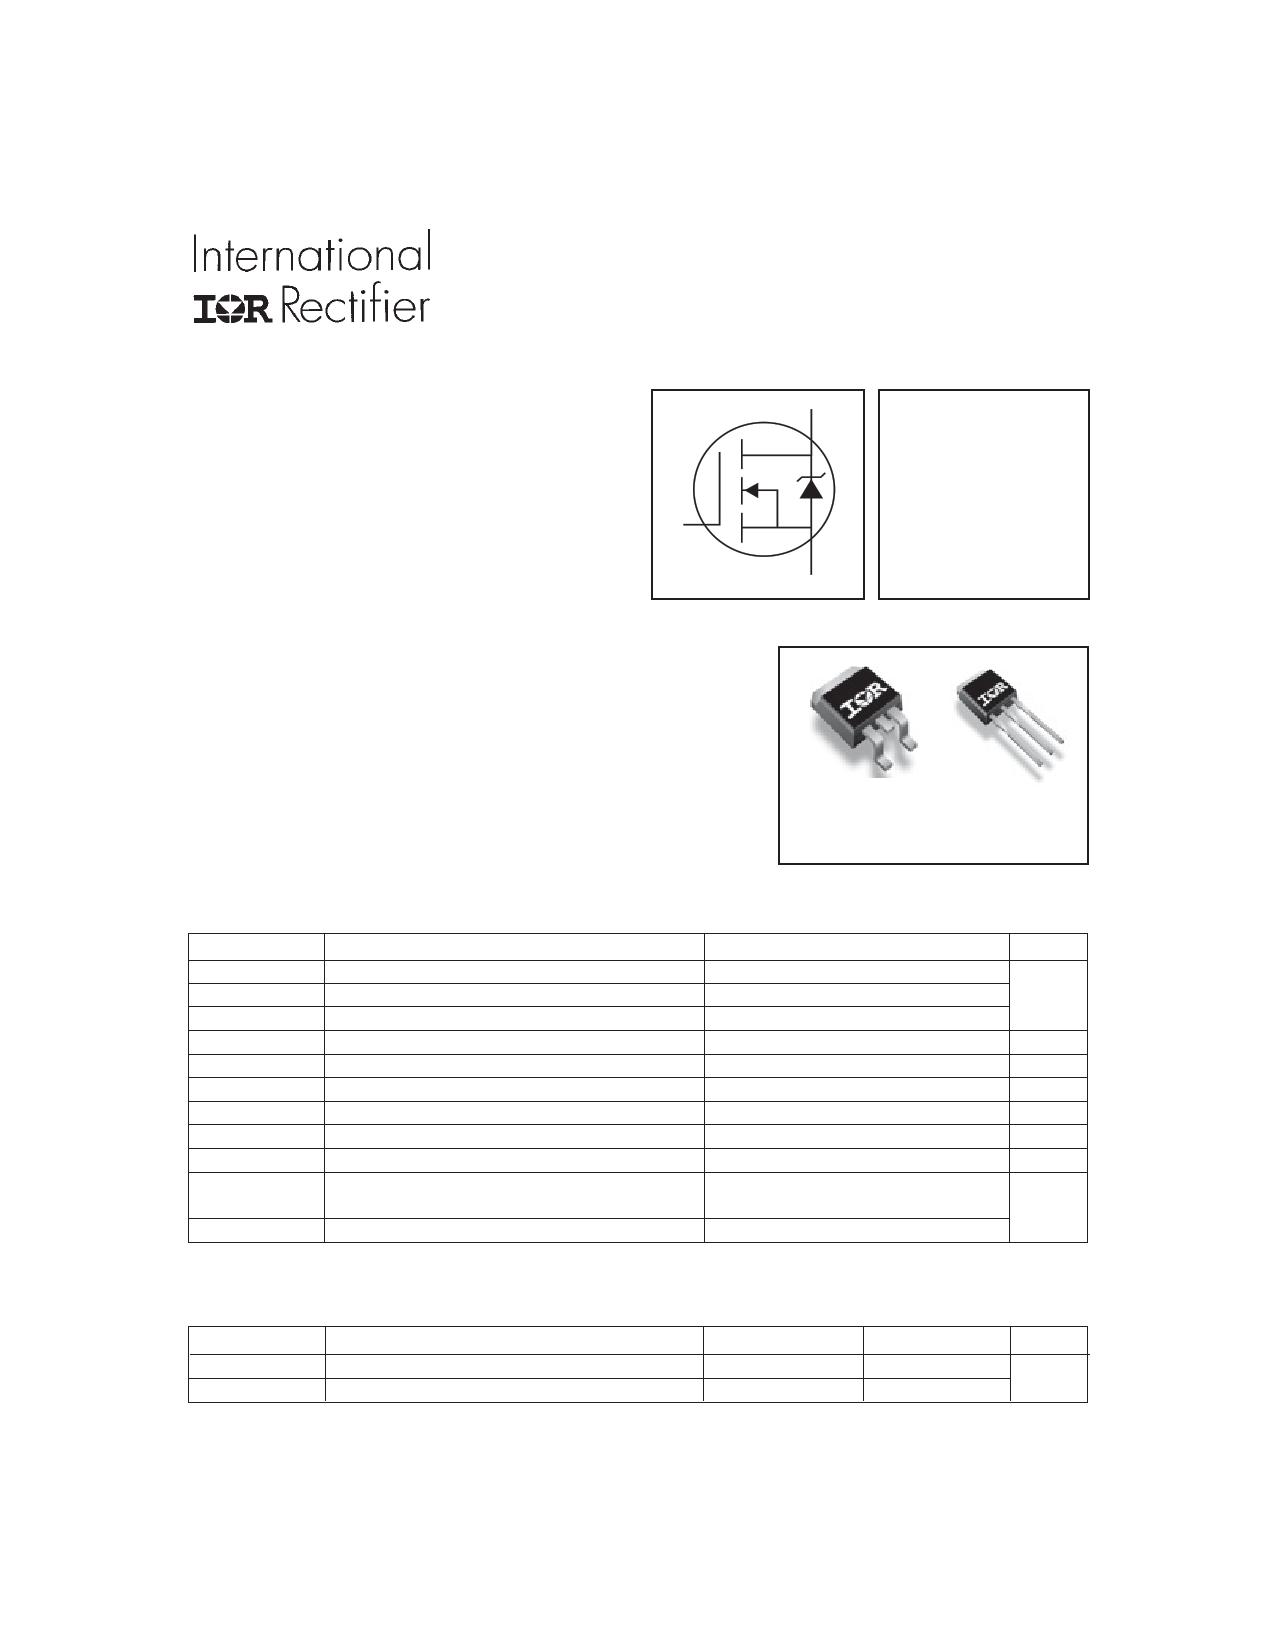 IRFZ34VLPBF Datasheet, IRFZ34VLPBF PDF,ピン配置, 機能